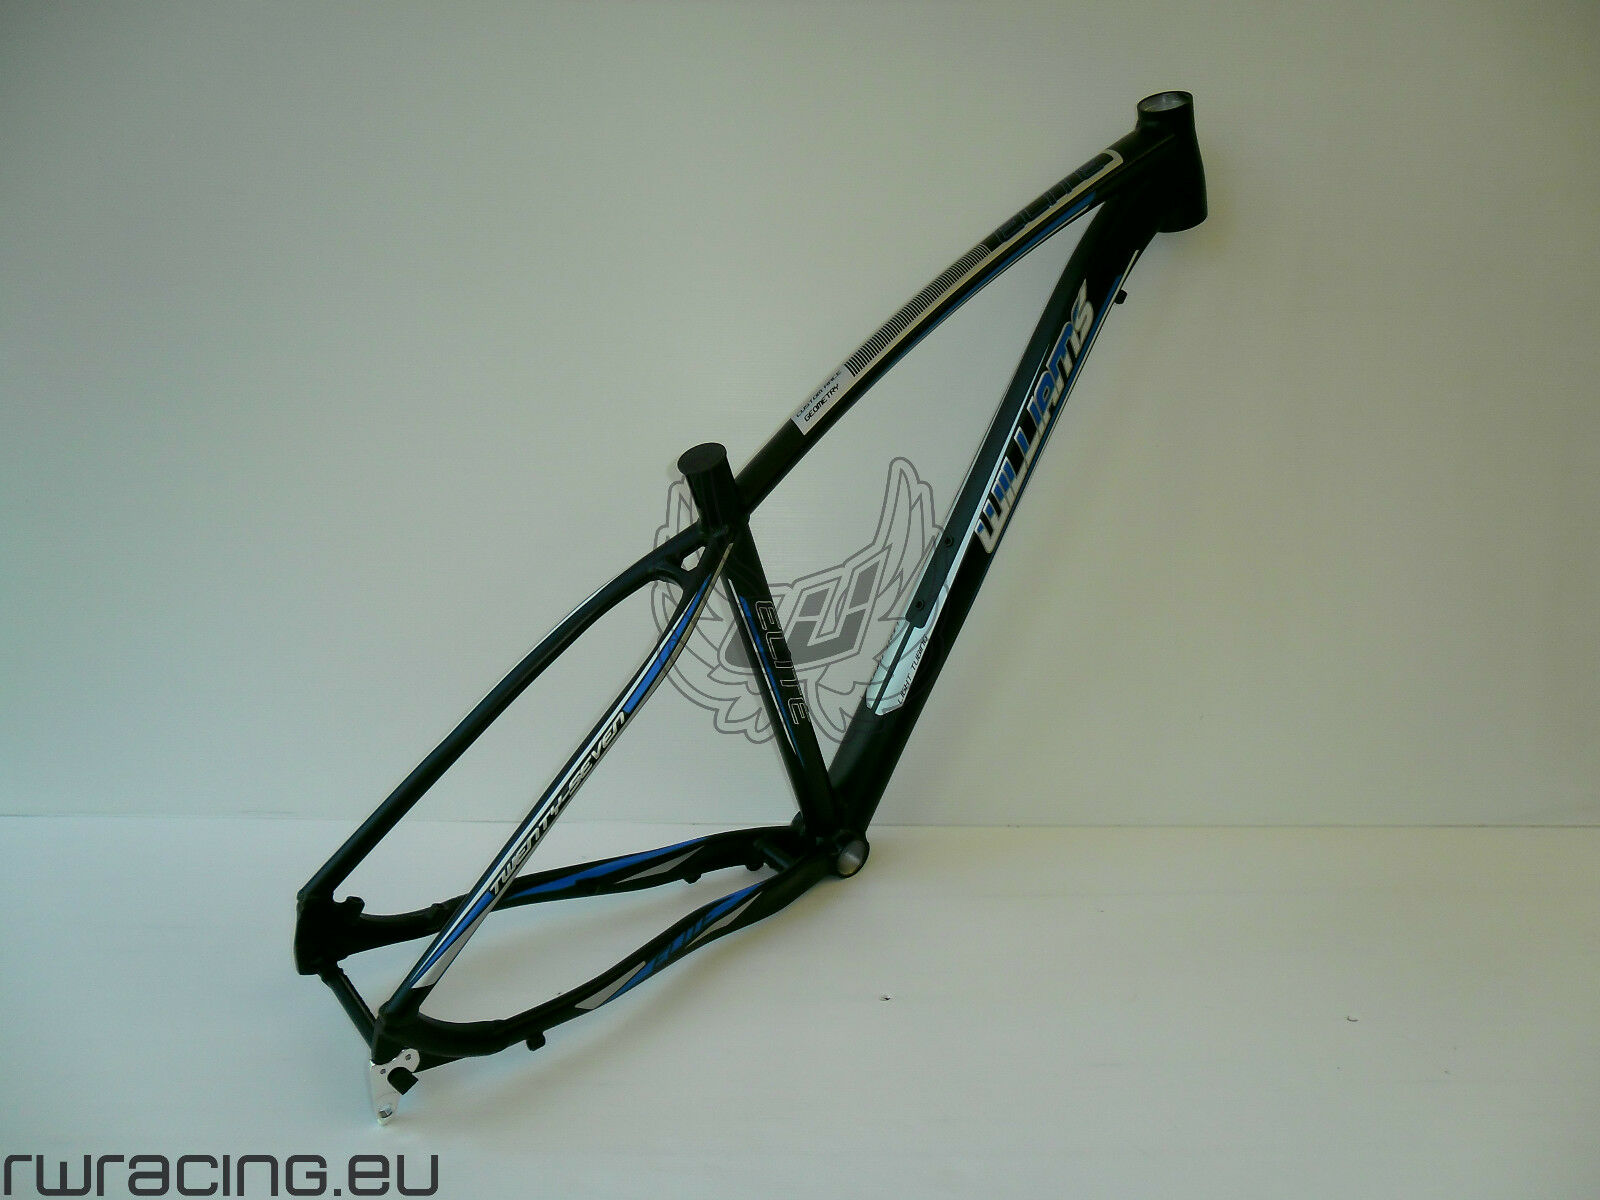 Telaio mtb 29 per bici   xc   crosscountry in alluminio Williams negro   azul